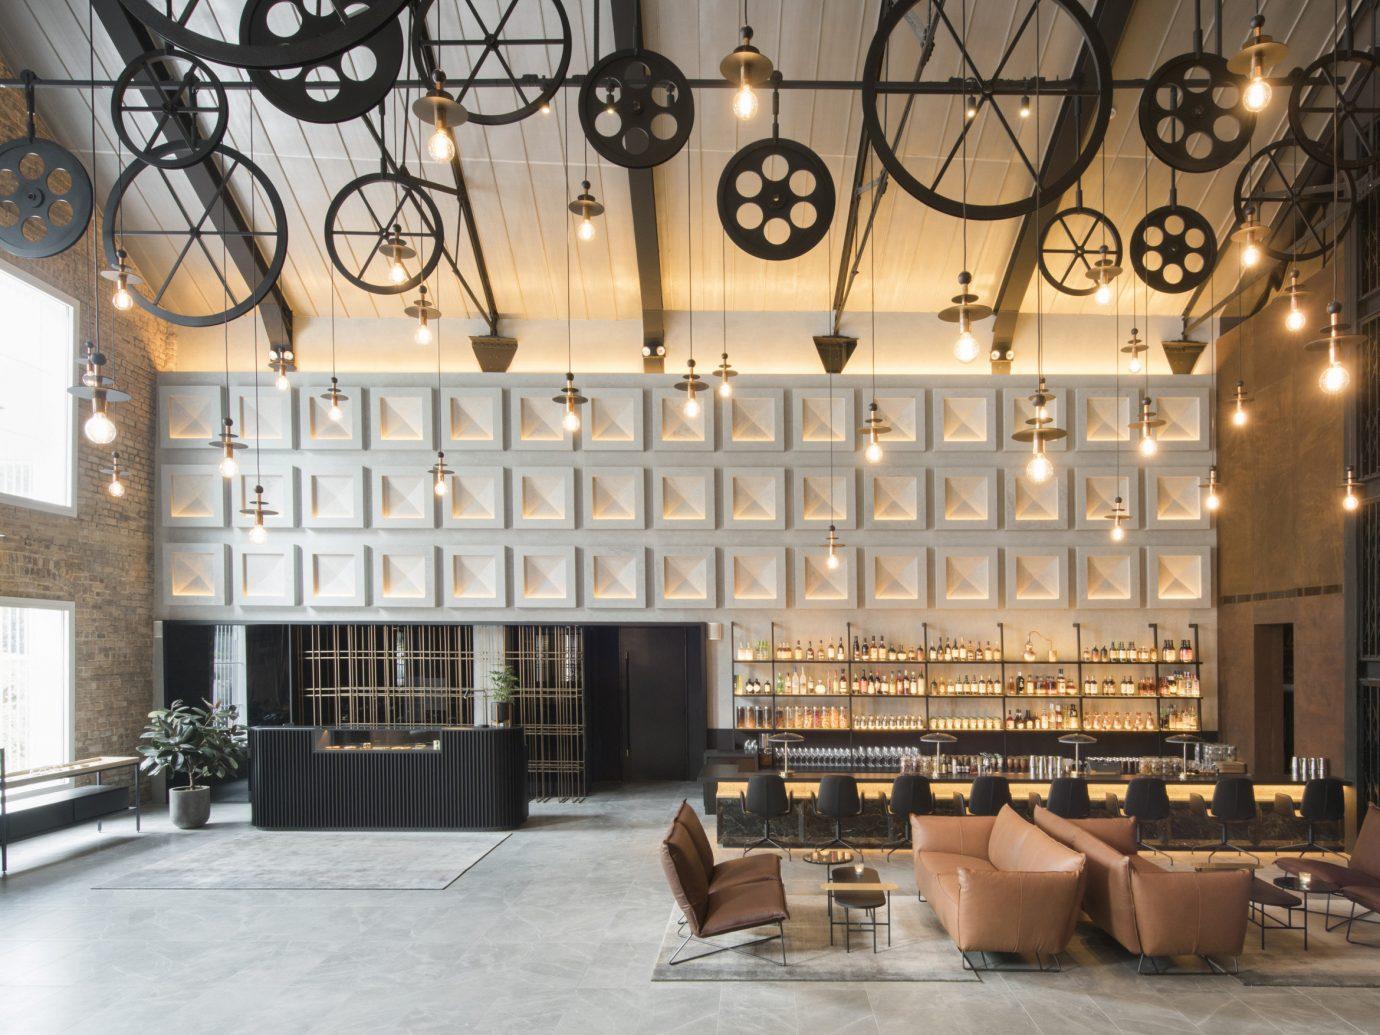 Hotels building property Lobby interior design estate Design dining room